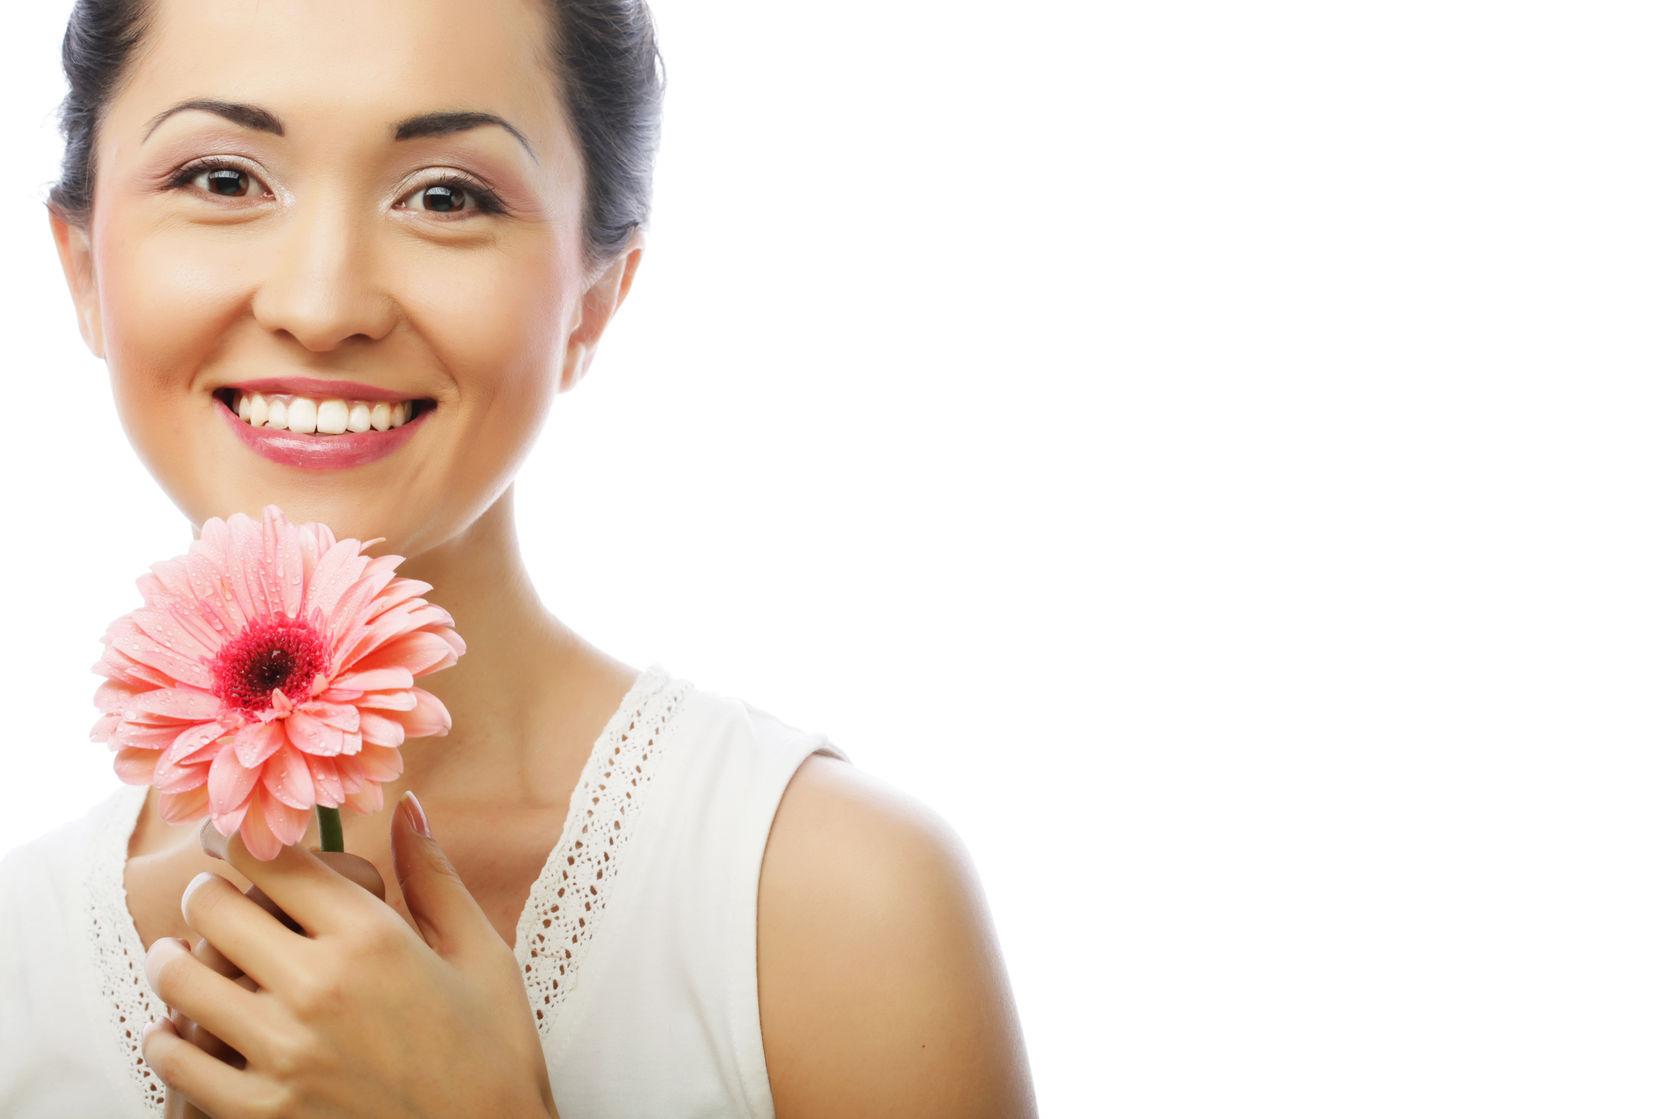 Beautiful Asian Woman - Dermal Fillers Treatment